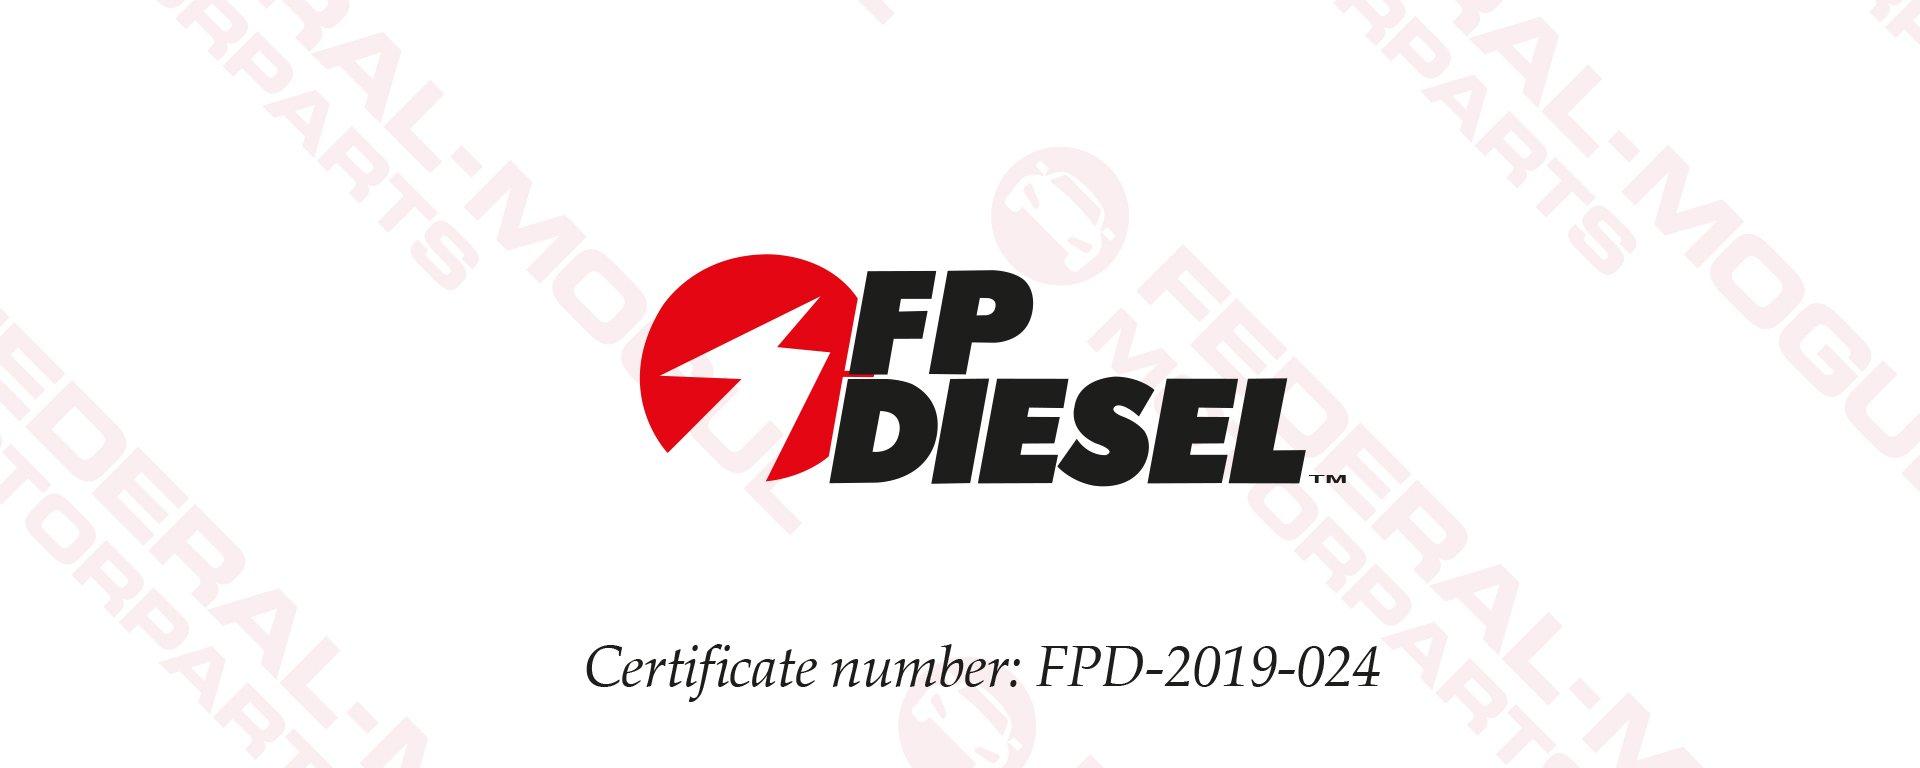 fpdiesel2019 banner1